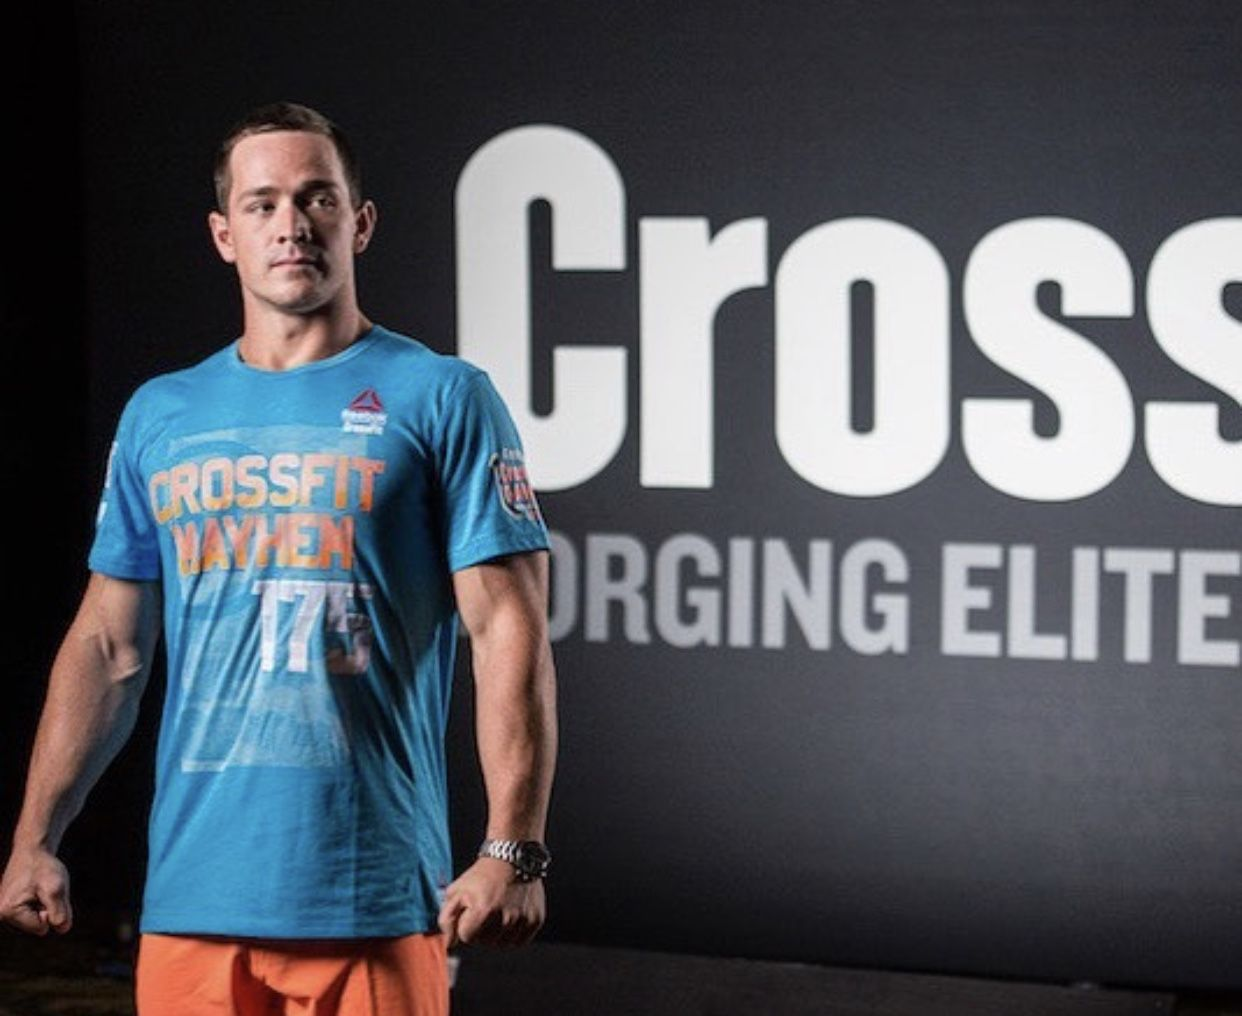 efe98b75db5 James Hobart Returns to Reebok CrossFit® Games Regionals As an Individual  Athlete https